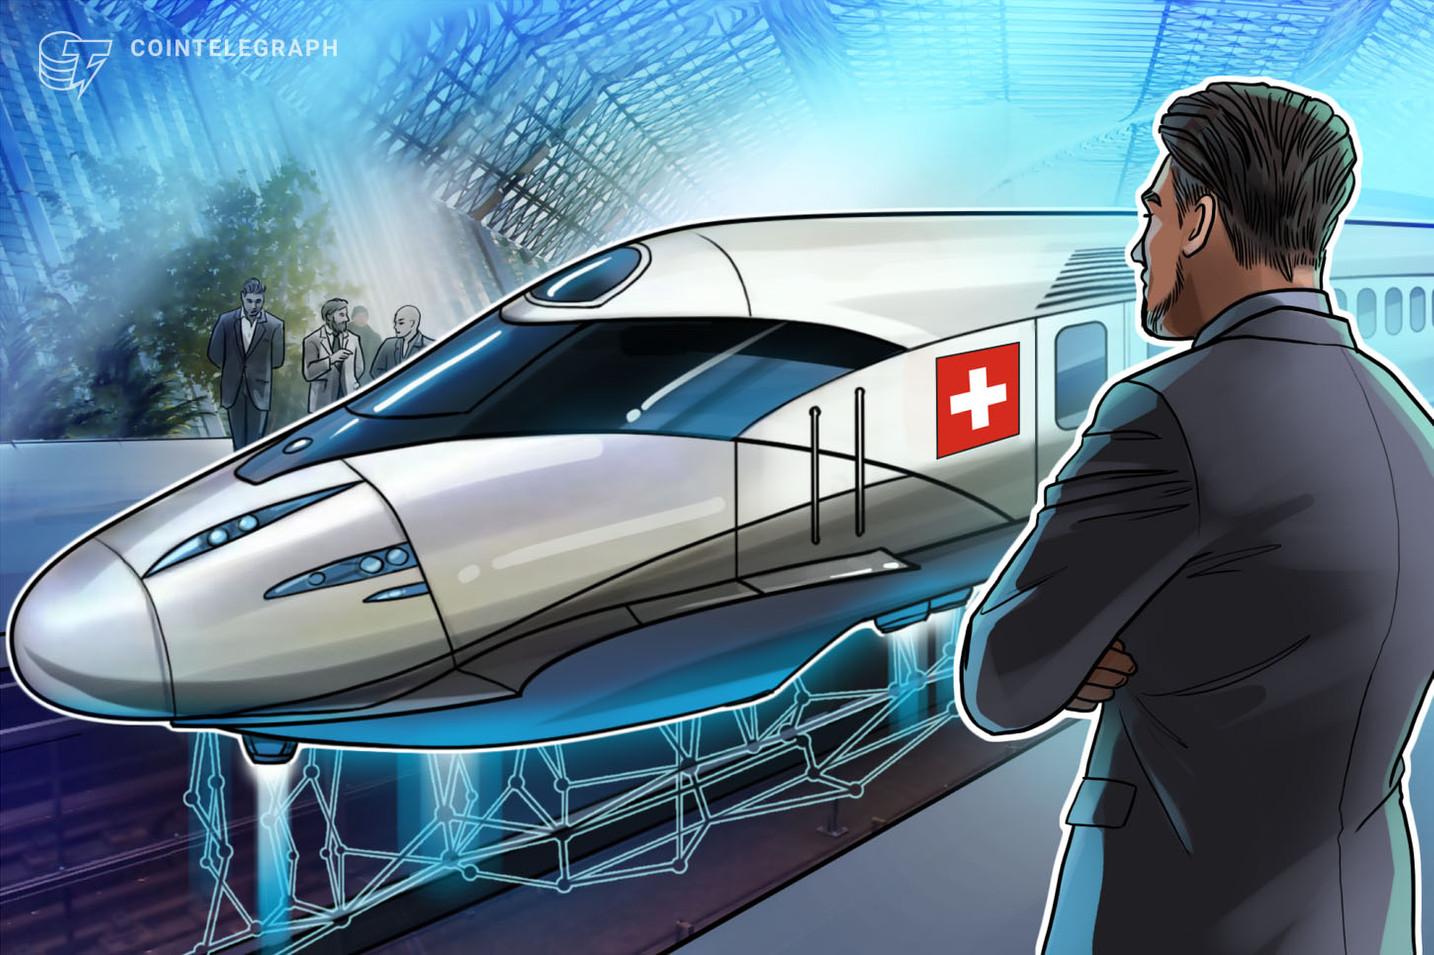 Swiss Post & Swisscom Launch '100% Swiss' Blockchain Infrastructure